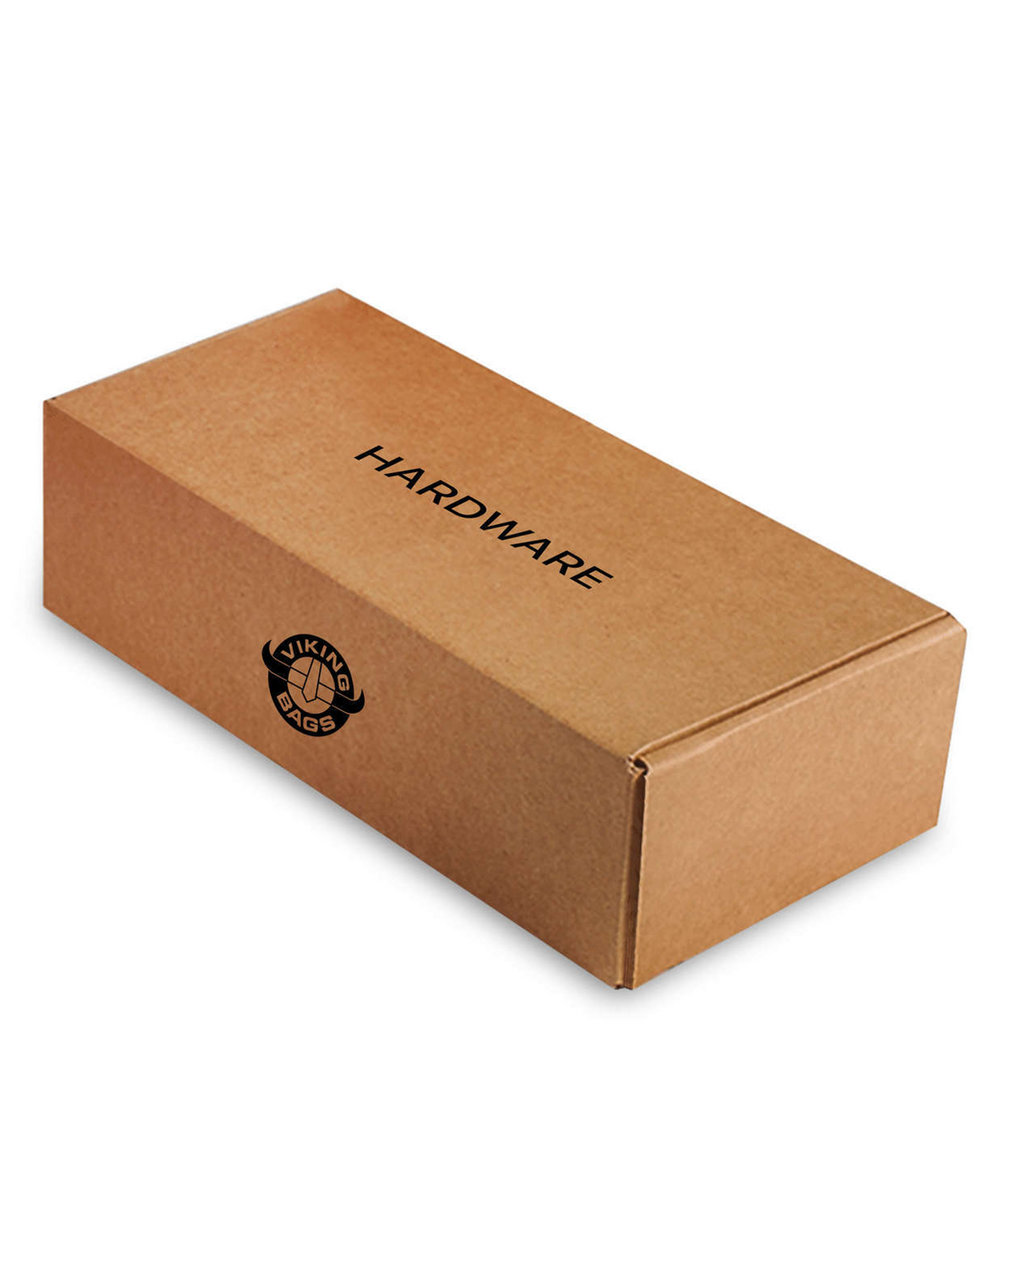 Honda VTX 1800 R Charger Single Strap Medium Motorcycle Saddlebags Hardware Box